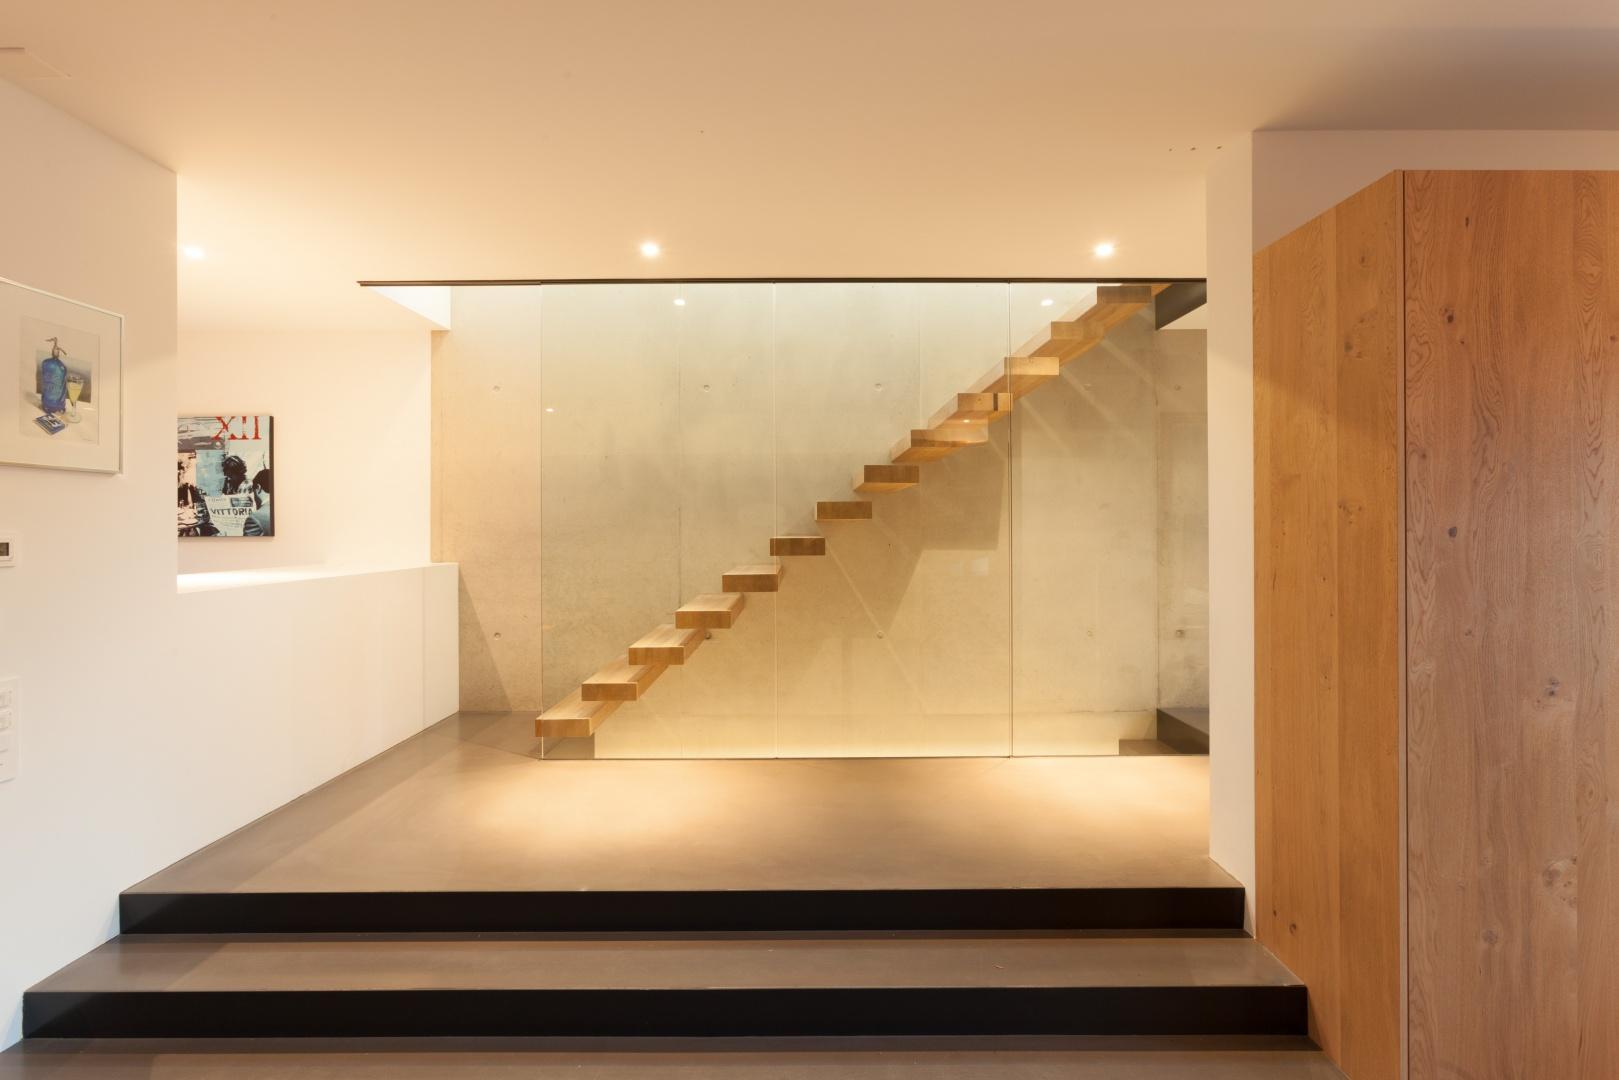 Treppe-EG-OG © von Mann Architektur GmbH, Sonnenhofstrasse 2, 8132 Egg